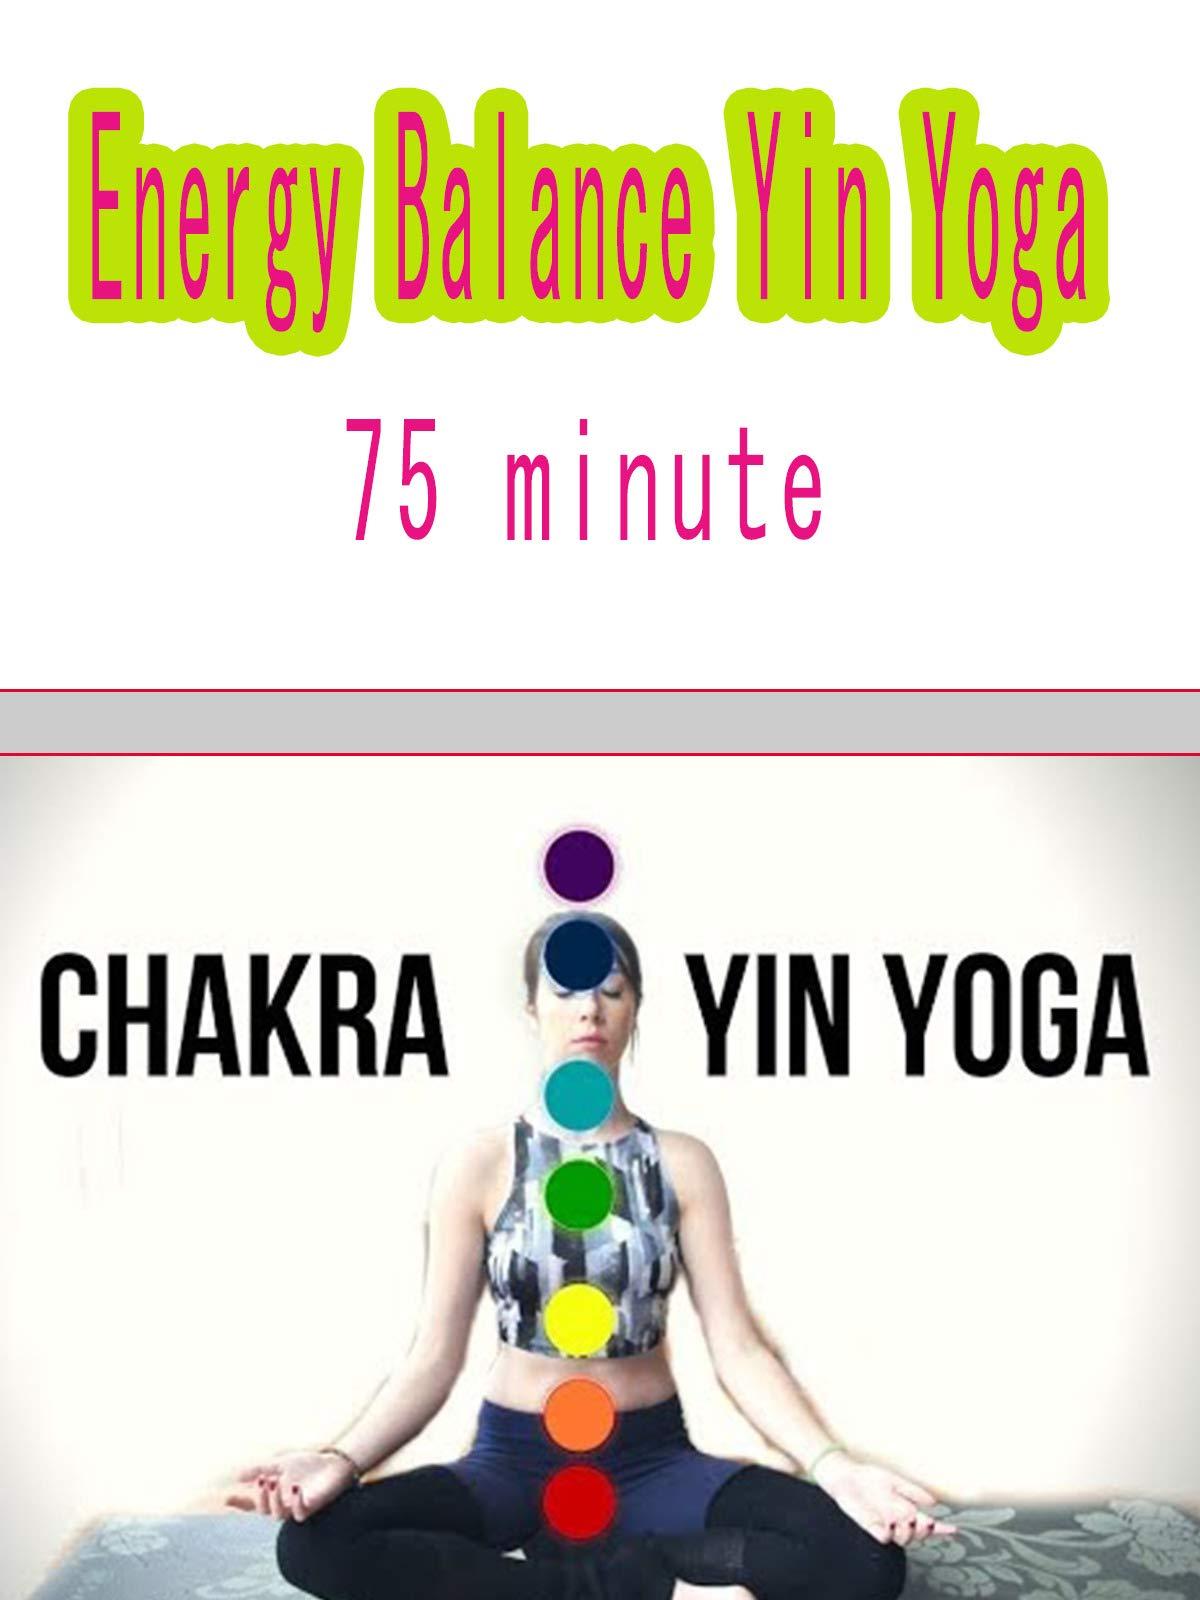 Chakra Yin Yoga - Energy Balance Yin Yoga - 75 minute